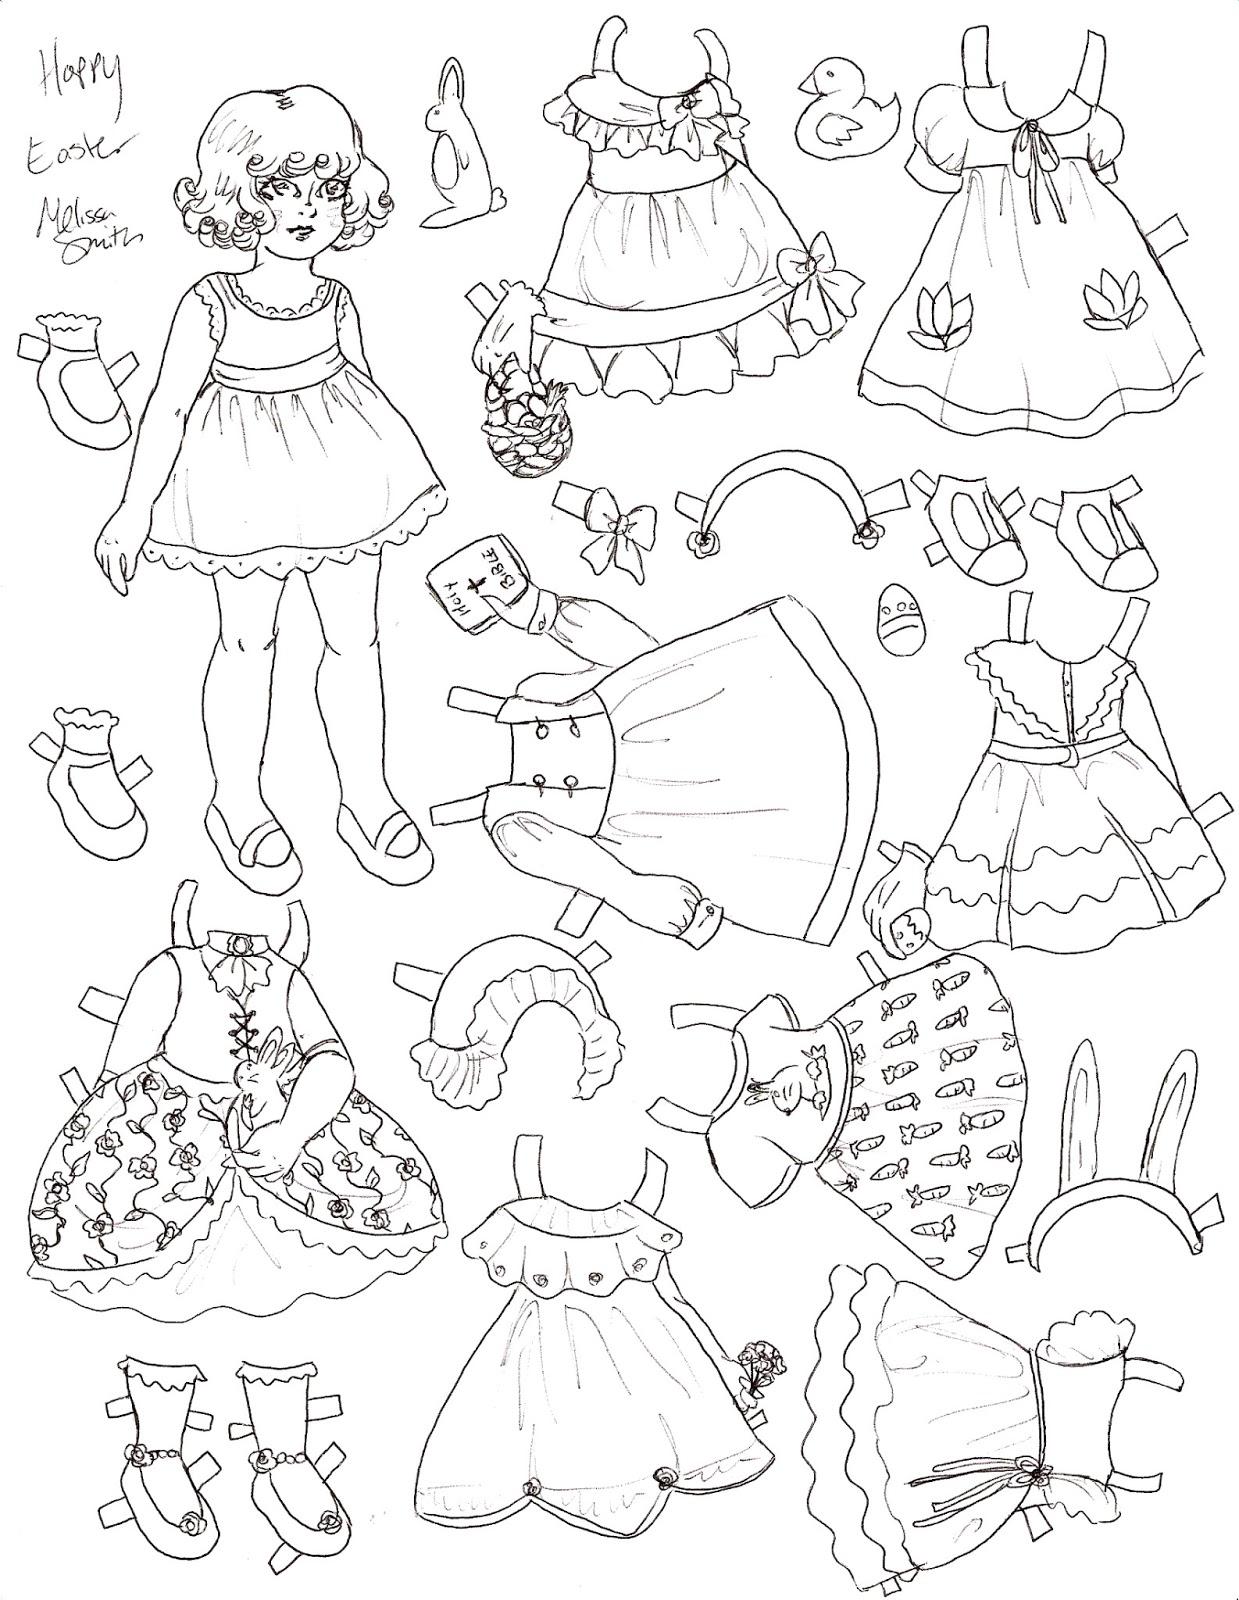 miss missy paper dolls happy easter paper doll. Black Bedroom Furniture Sets. Home Design Ideas